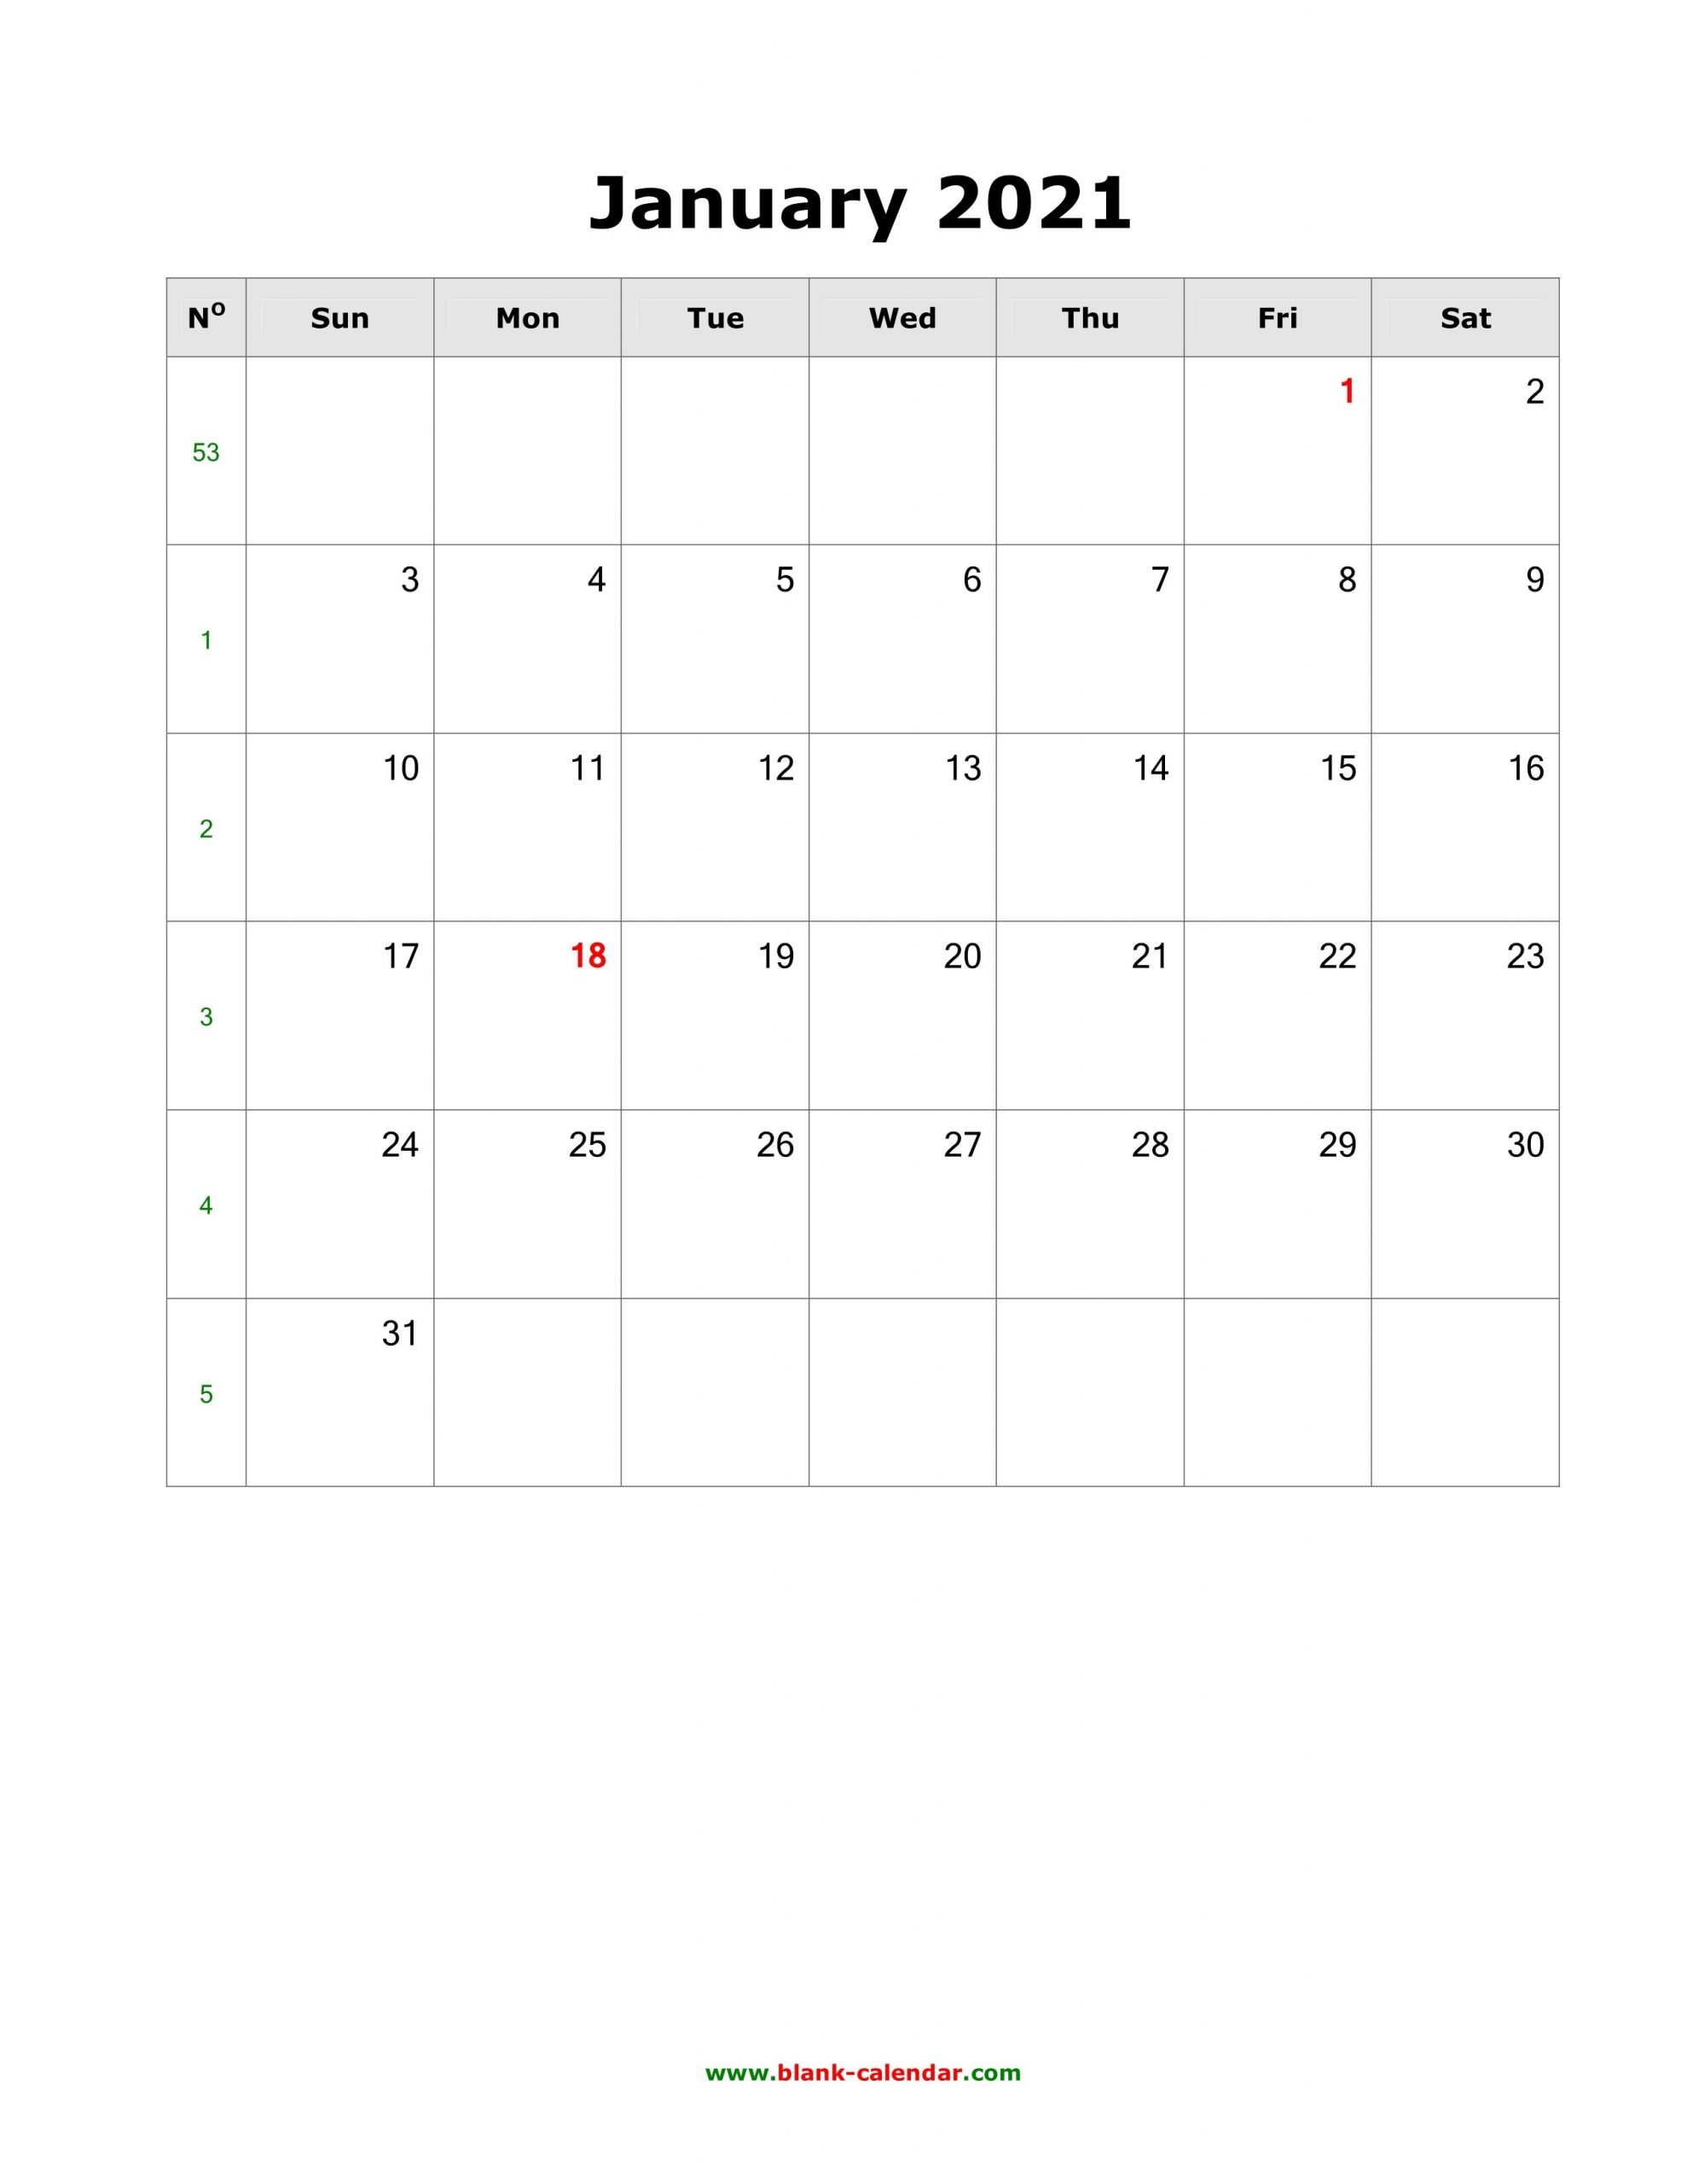 Download January 2021 Blank Calendar (Vertical)